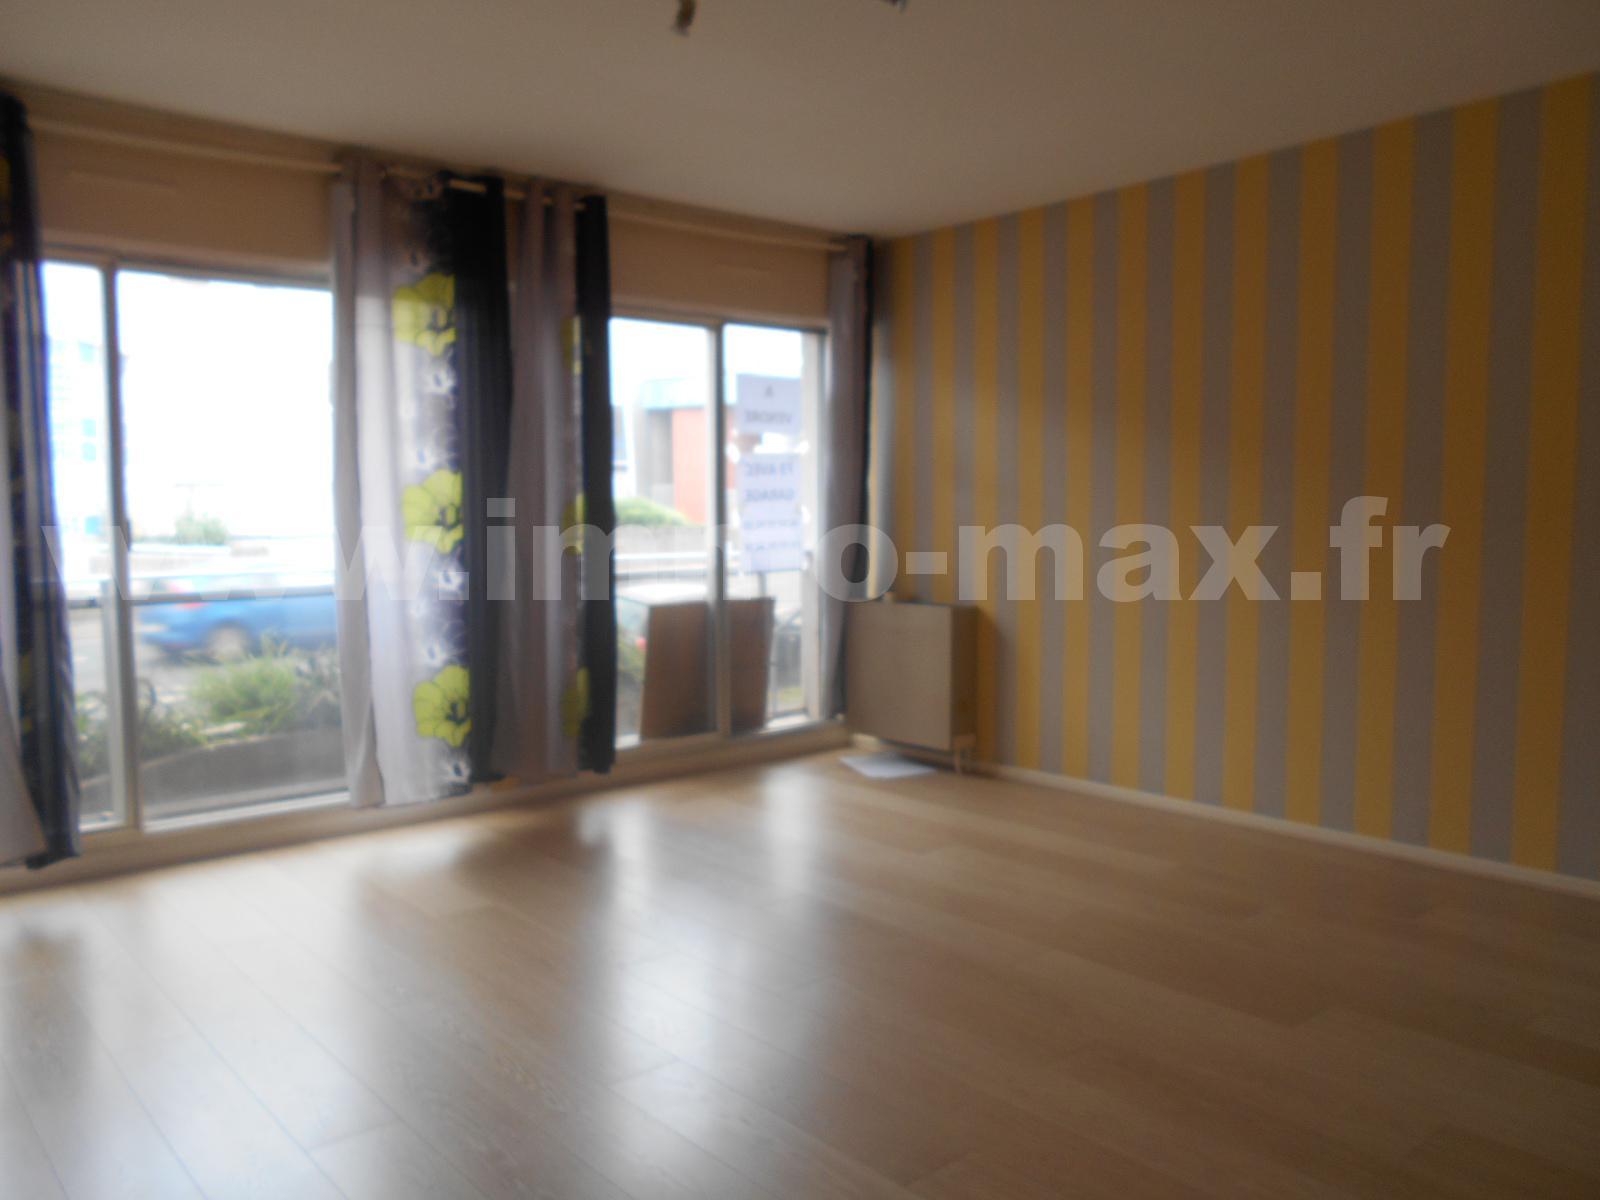 Vente appartement dunkerque 59240 4 pi ce s 71 m2 for Garage de la mer dunkerque